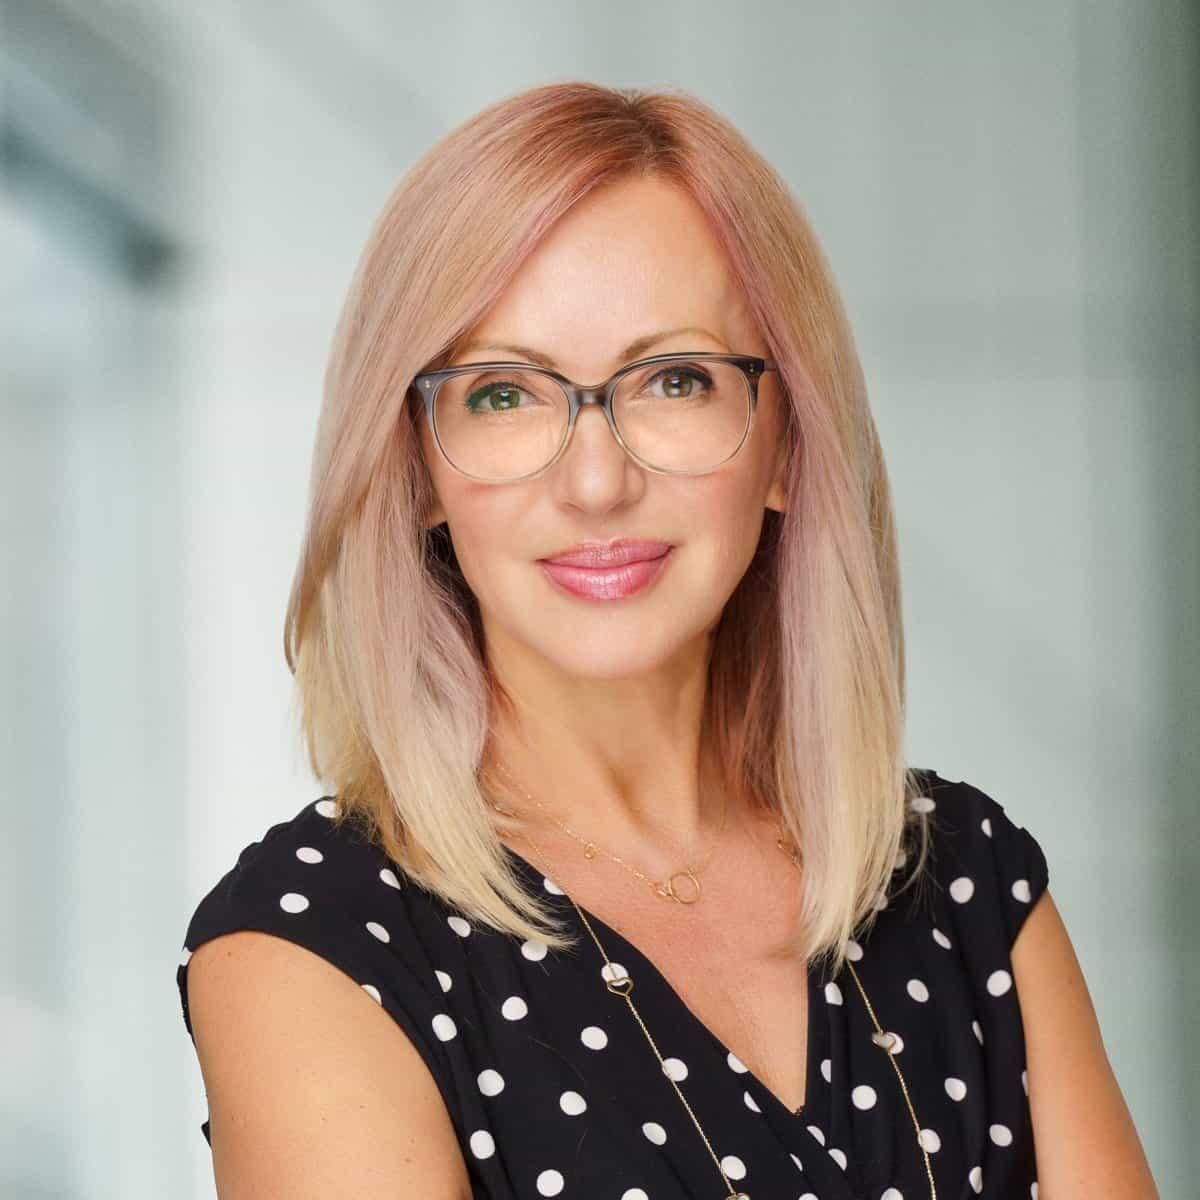 Professional LinkedIn Headshots Torontots Toronto